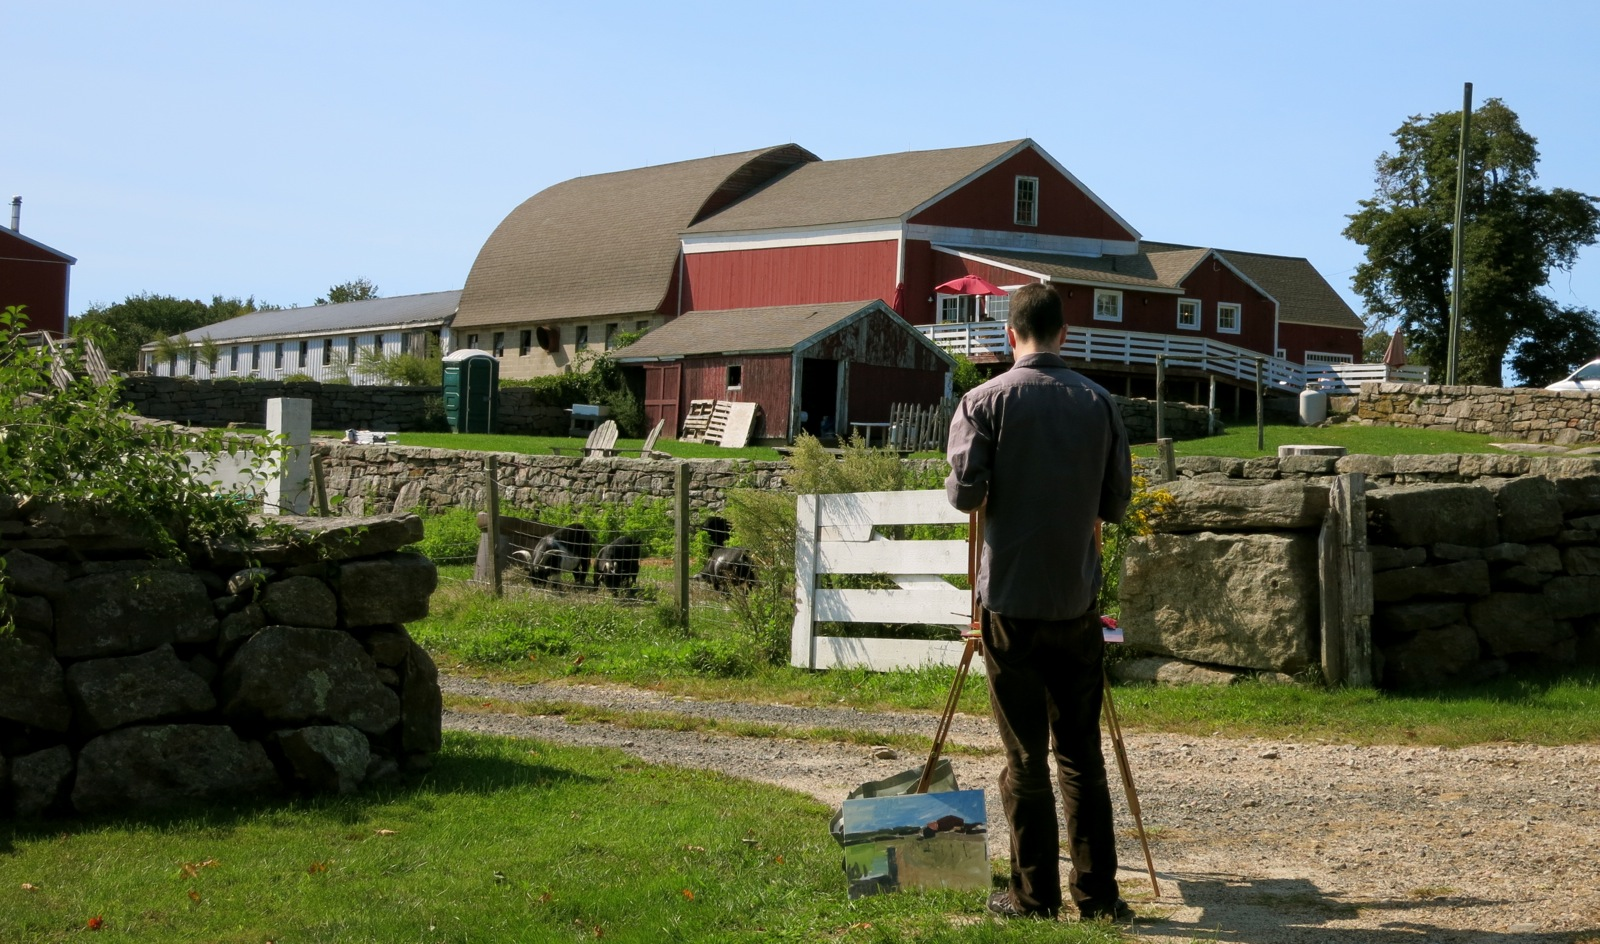 Ashlawn Farm Coffee - Artist captures barn on canvas - Old Lyme CT